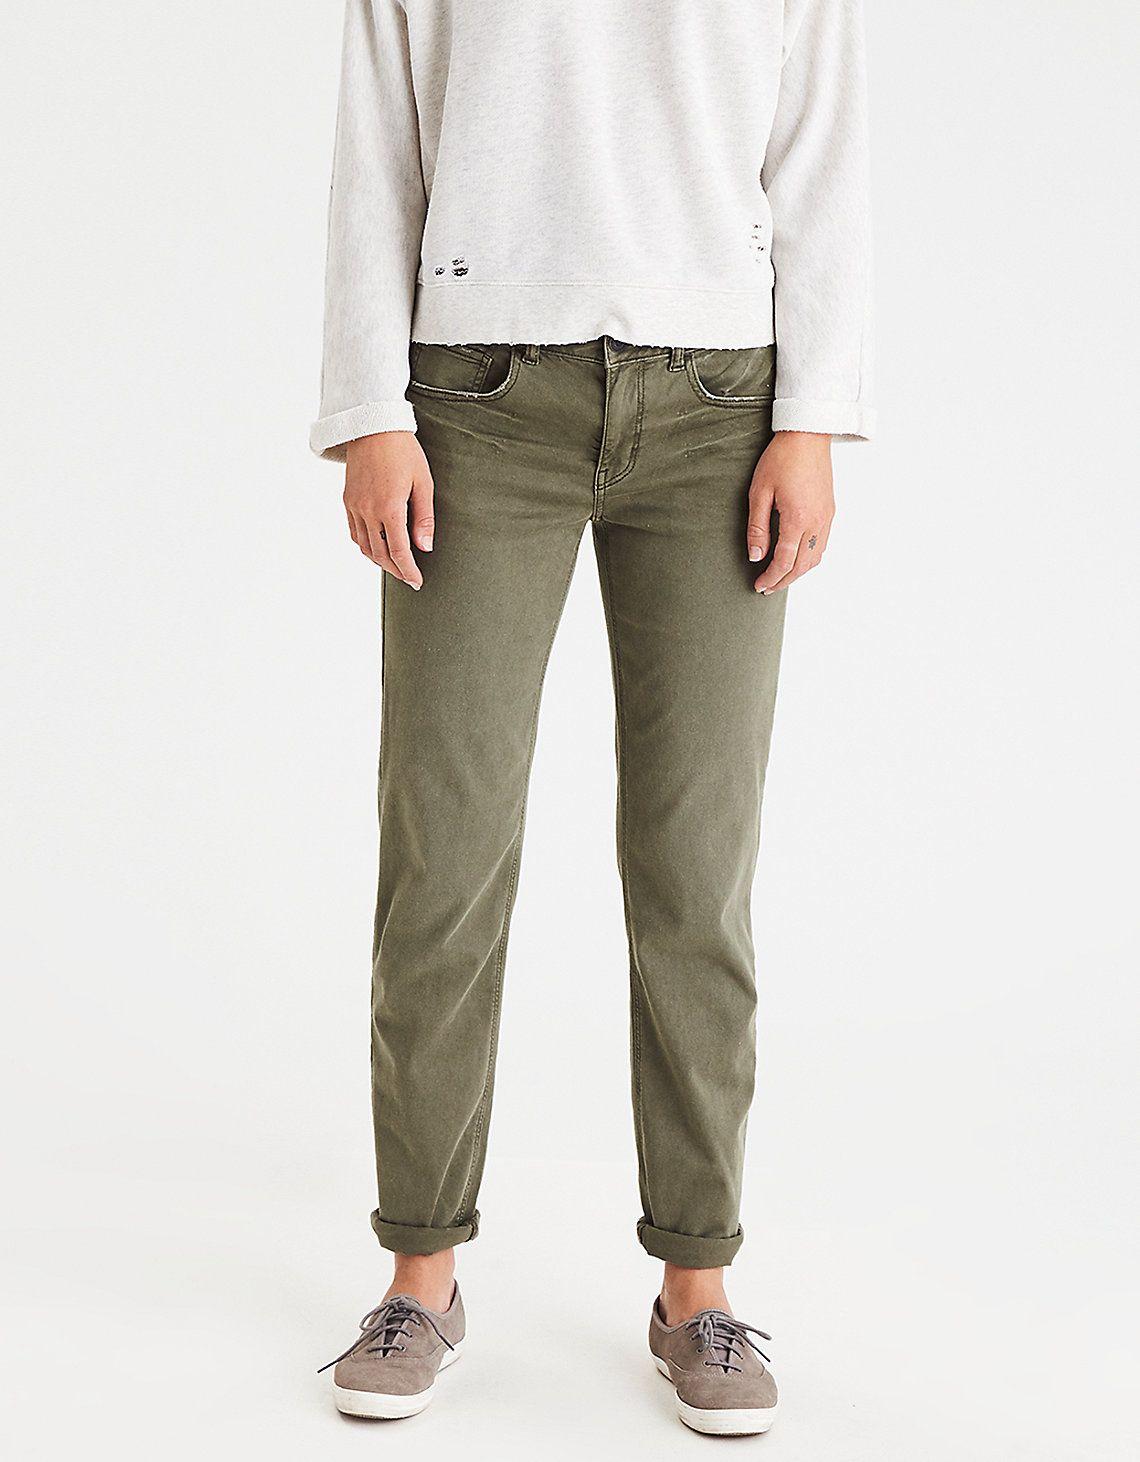 0df38fb0bb Tomgirl Pant, Onyx Black | Beauty & clothing | Pants, Denim, Khaki pants